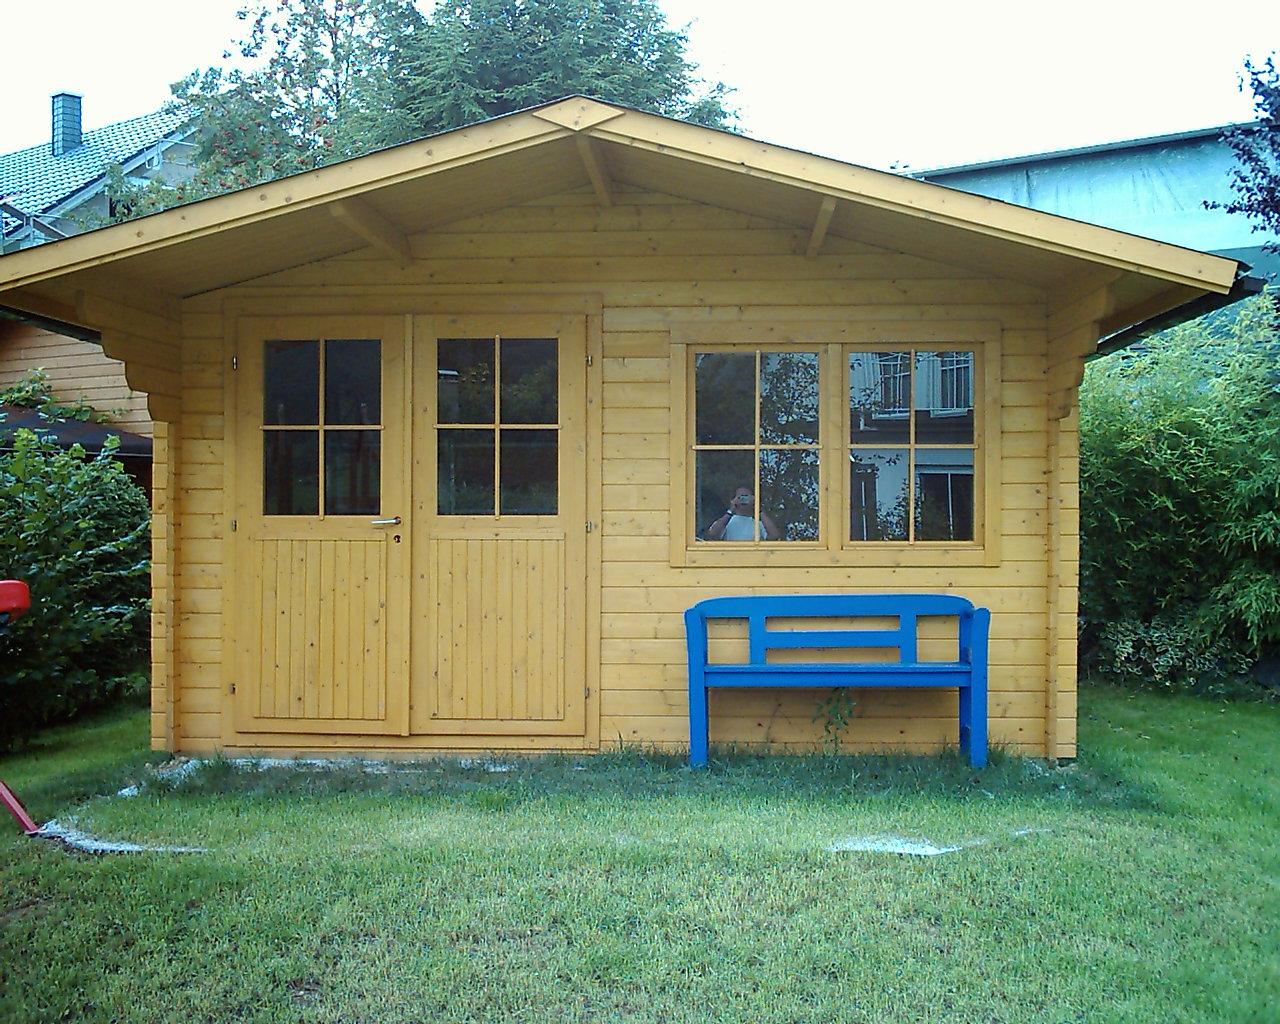 gartenhaus klasse wissenbach 34 sams gartenhaus shop. Black Bedroom Furniture Sets. Home Design Ideas